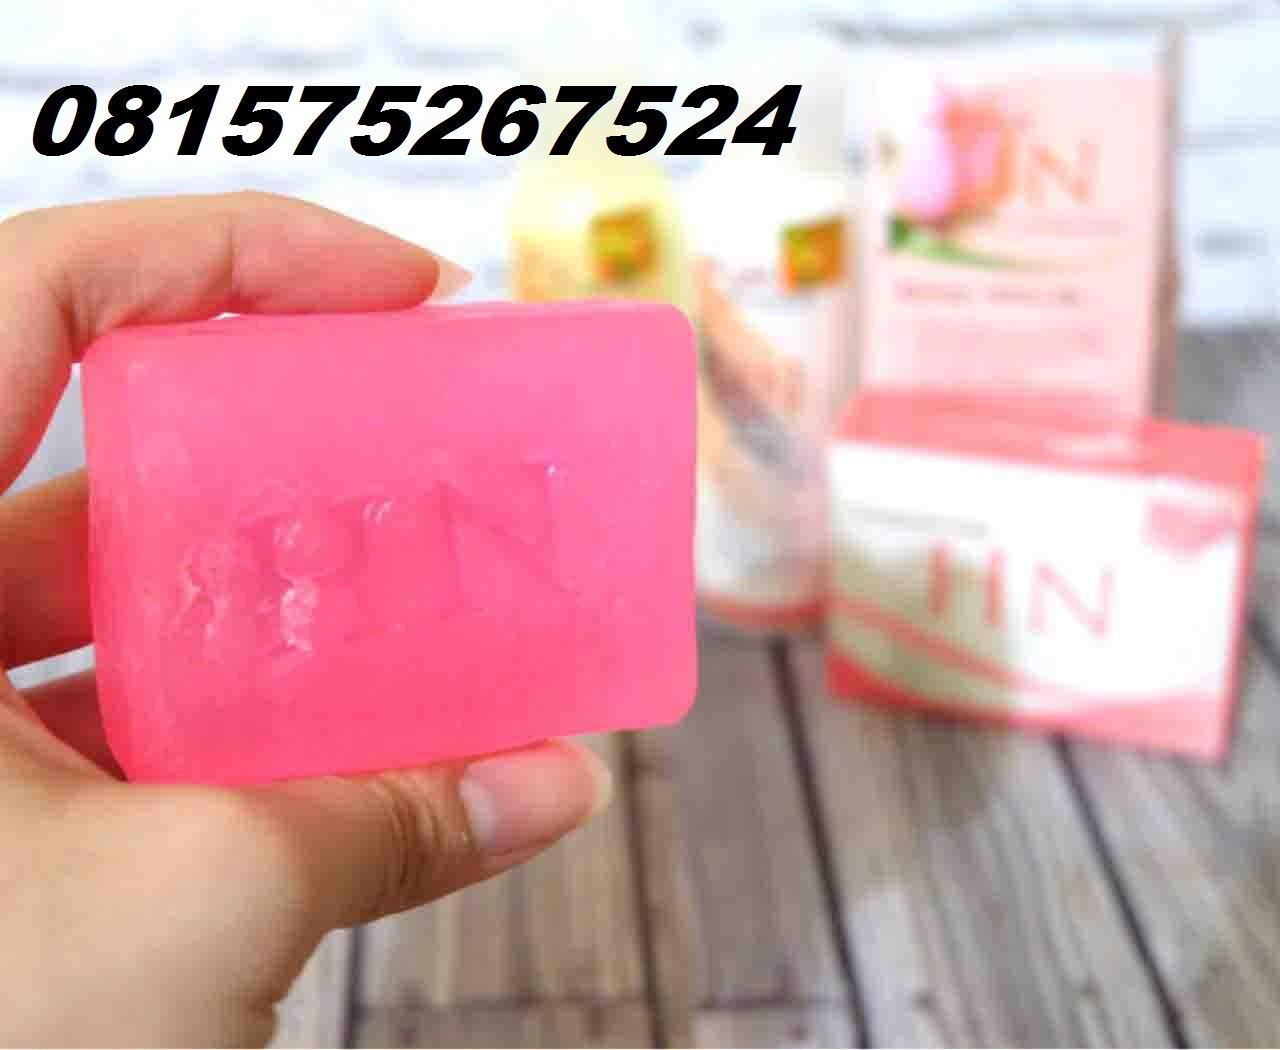 Paket Hn Pemutih Badan 4 In 1 Bpom 081575267524 Bbm 5f92d50c Body Whitening Kalimantan